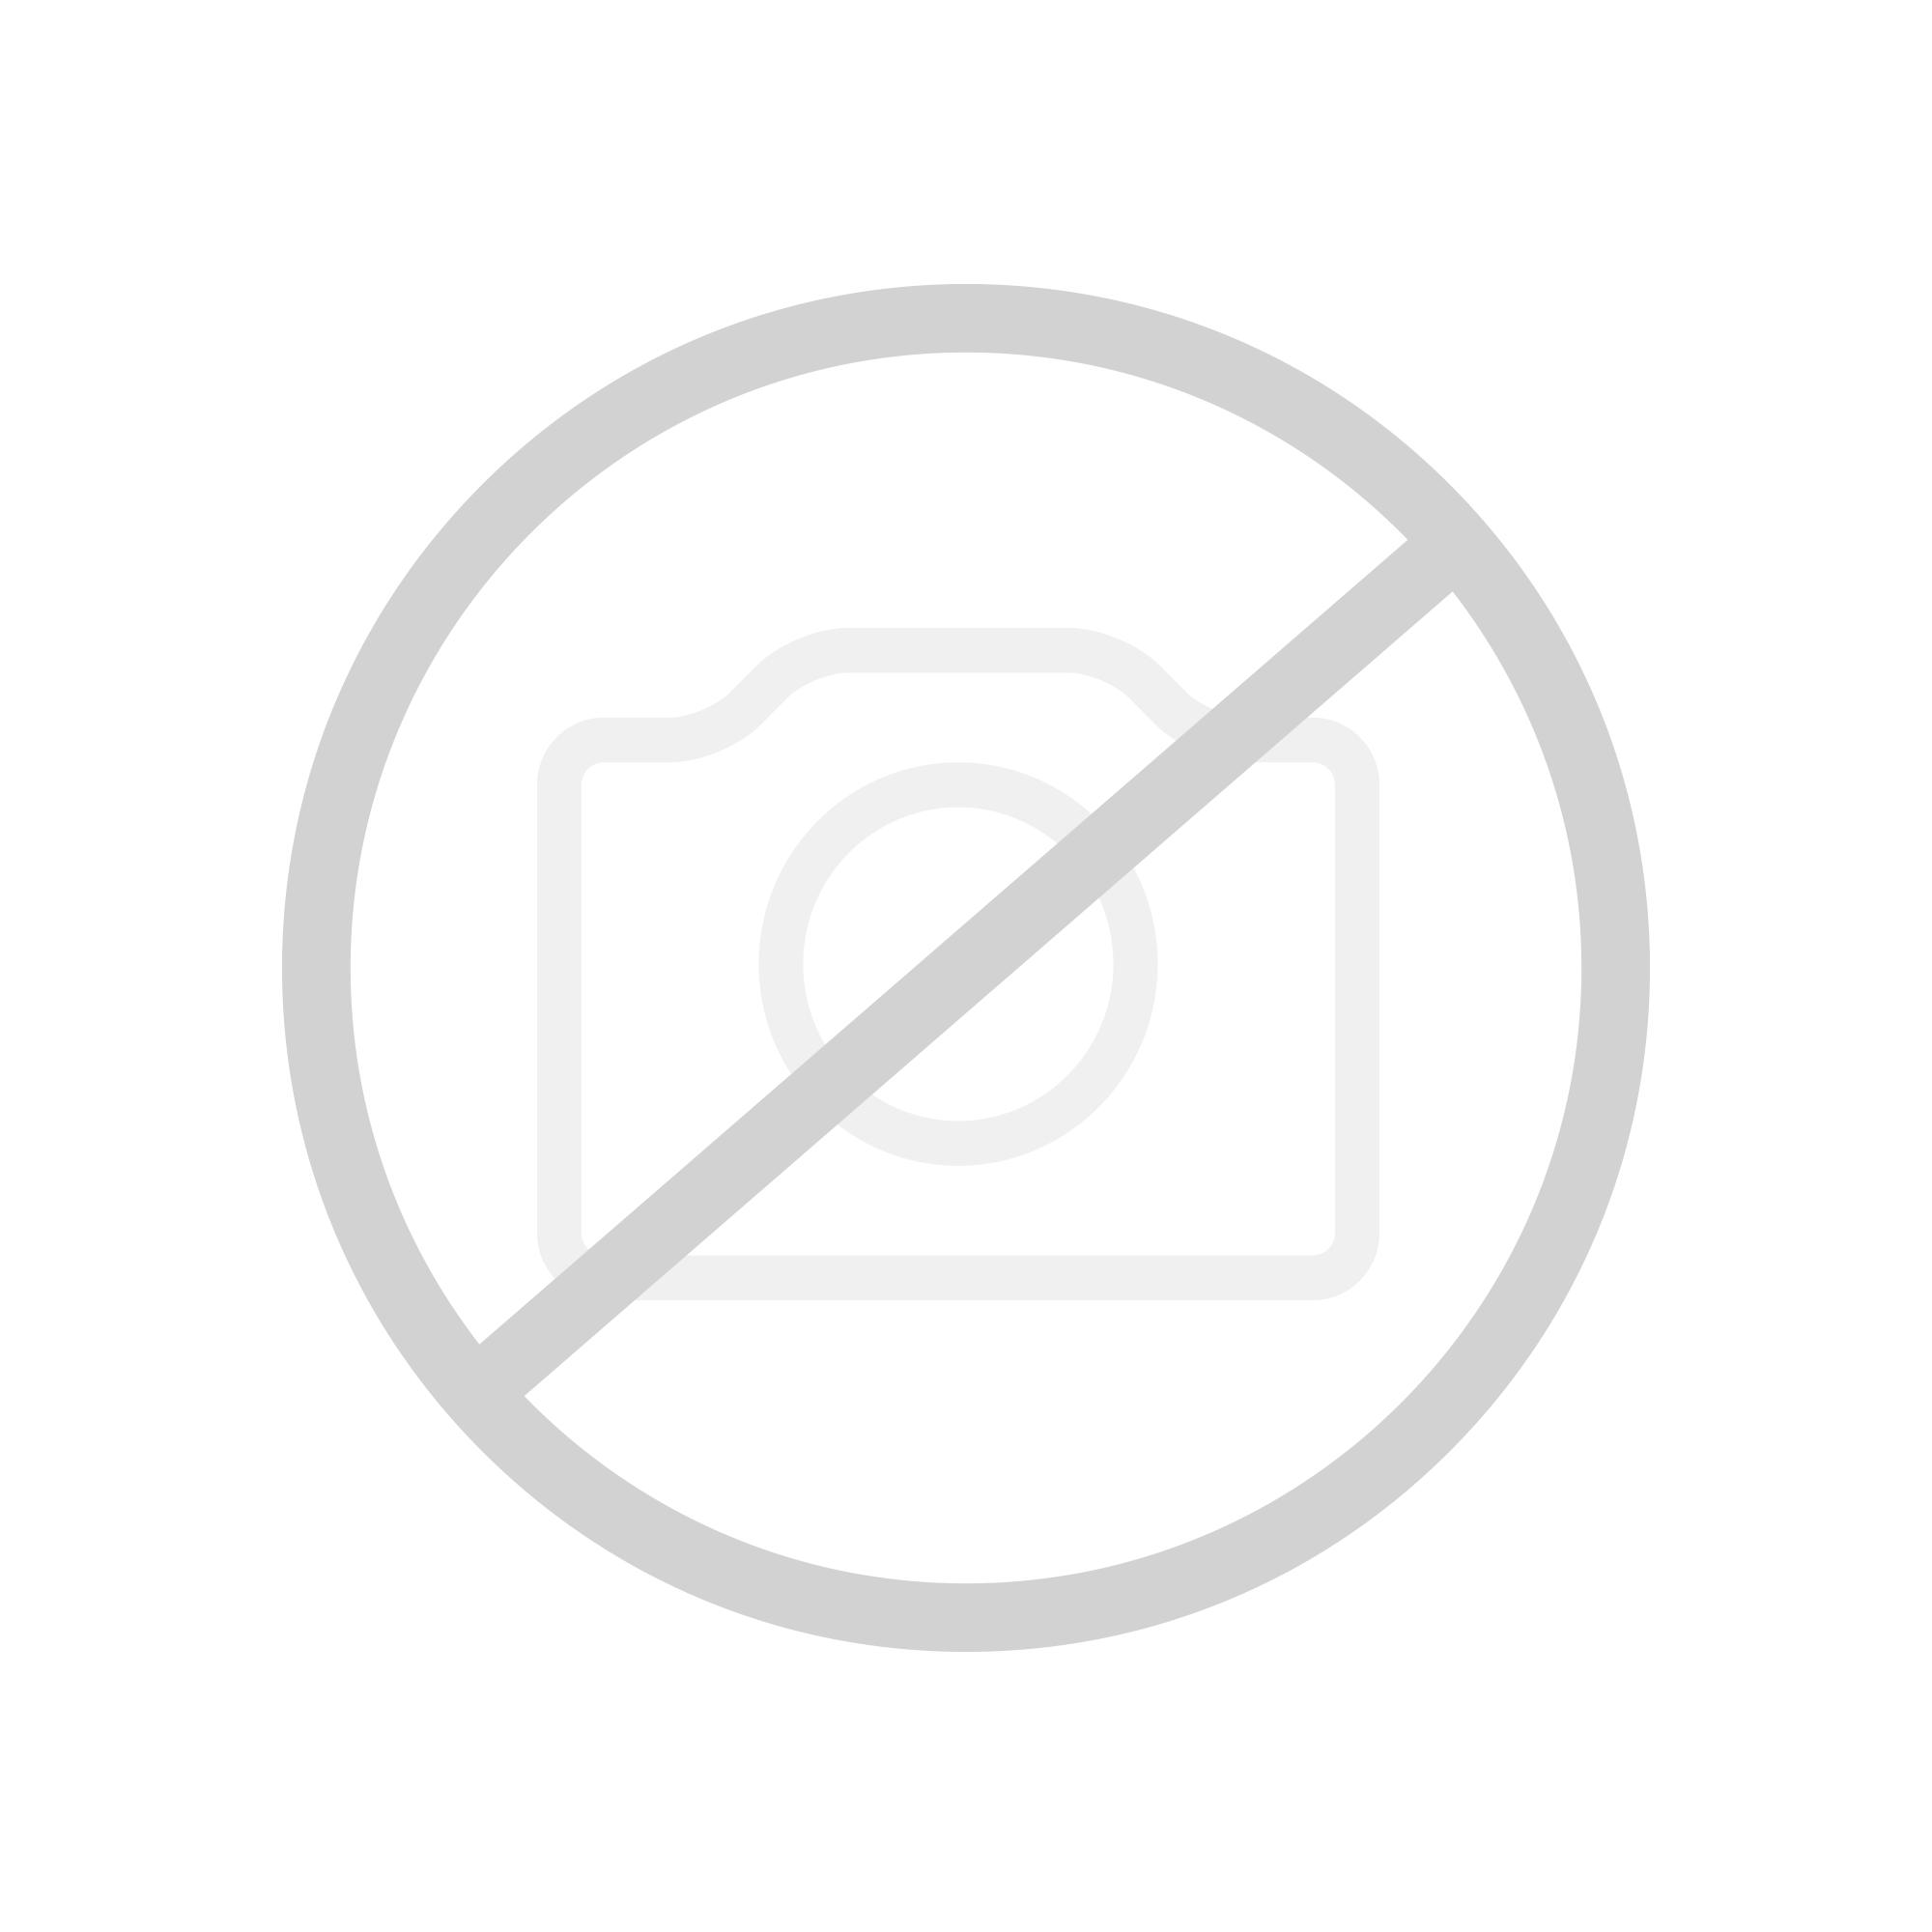 hansgrohe talis s einhebel brausemischer 32675000. Black Bedroom Furniture Sets. Home Design Ideas